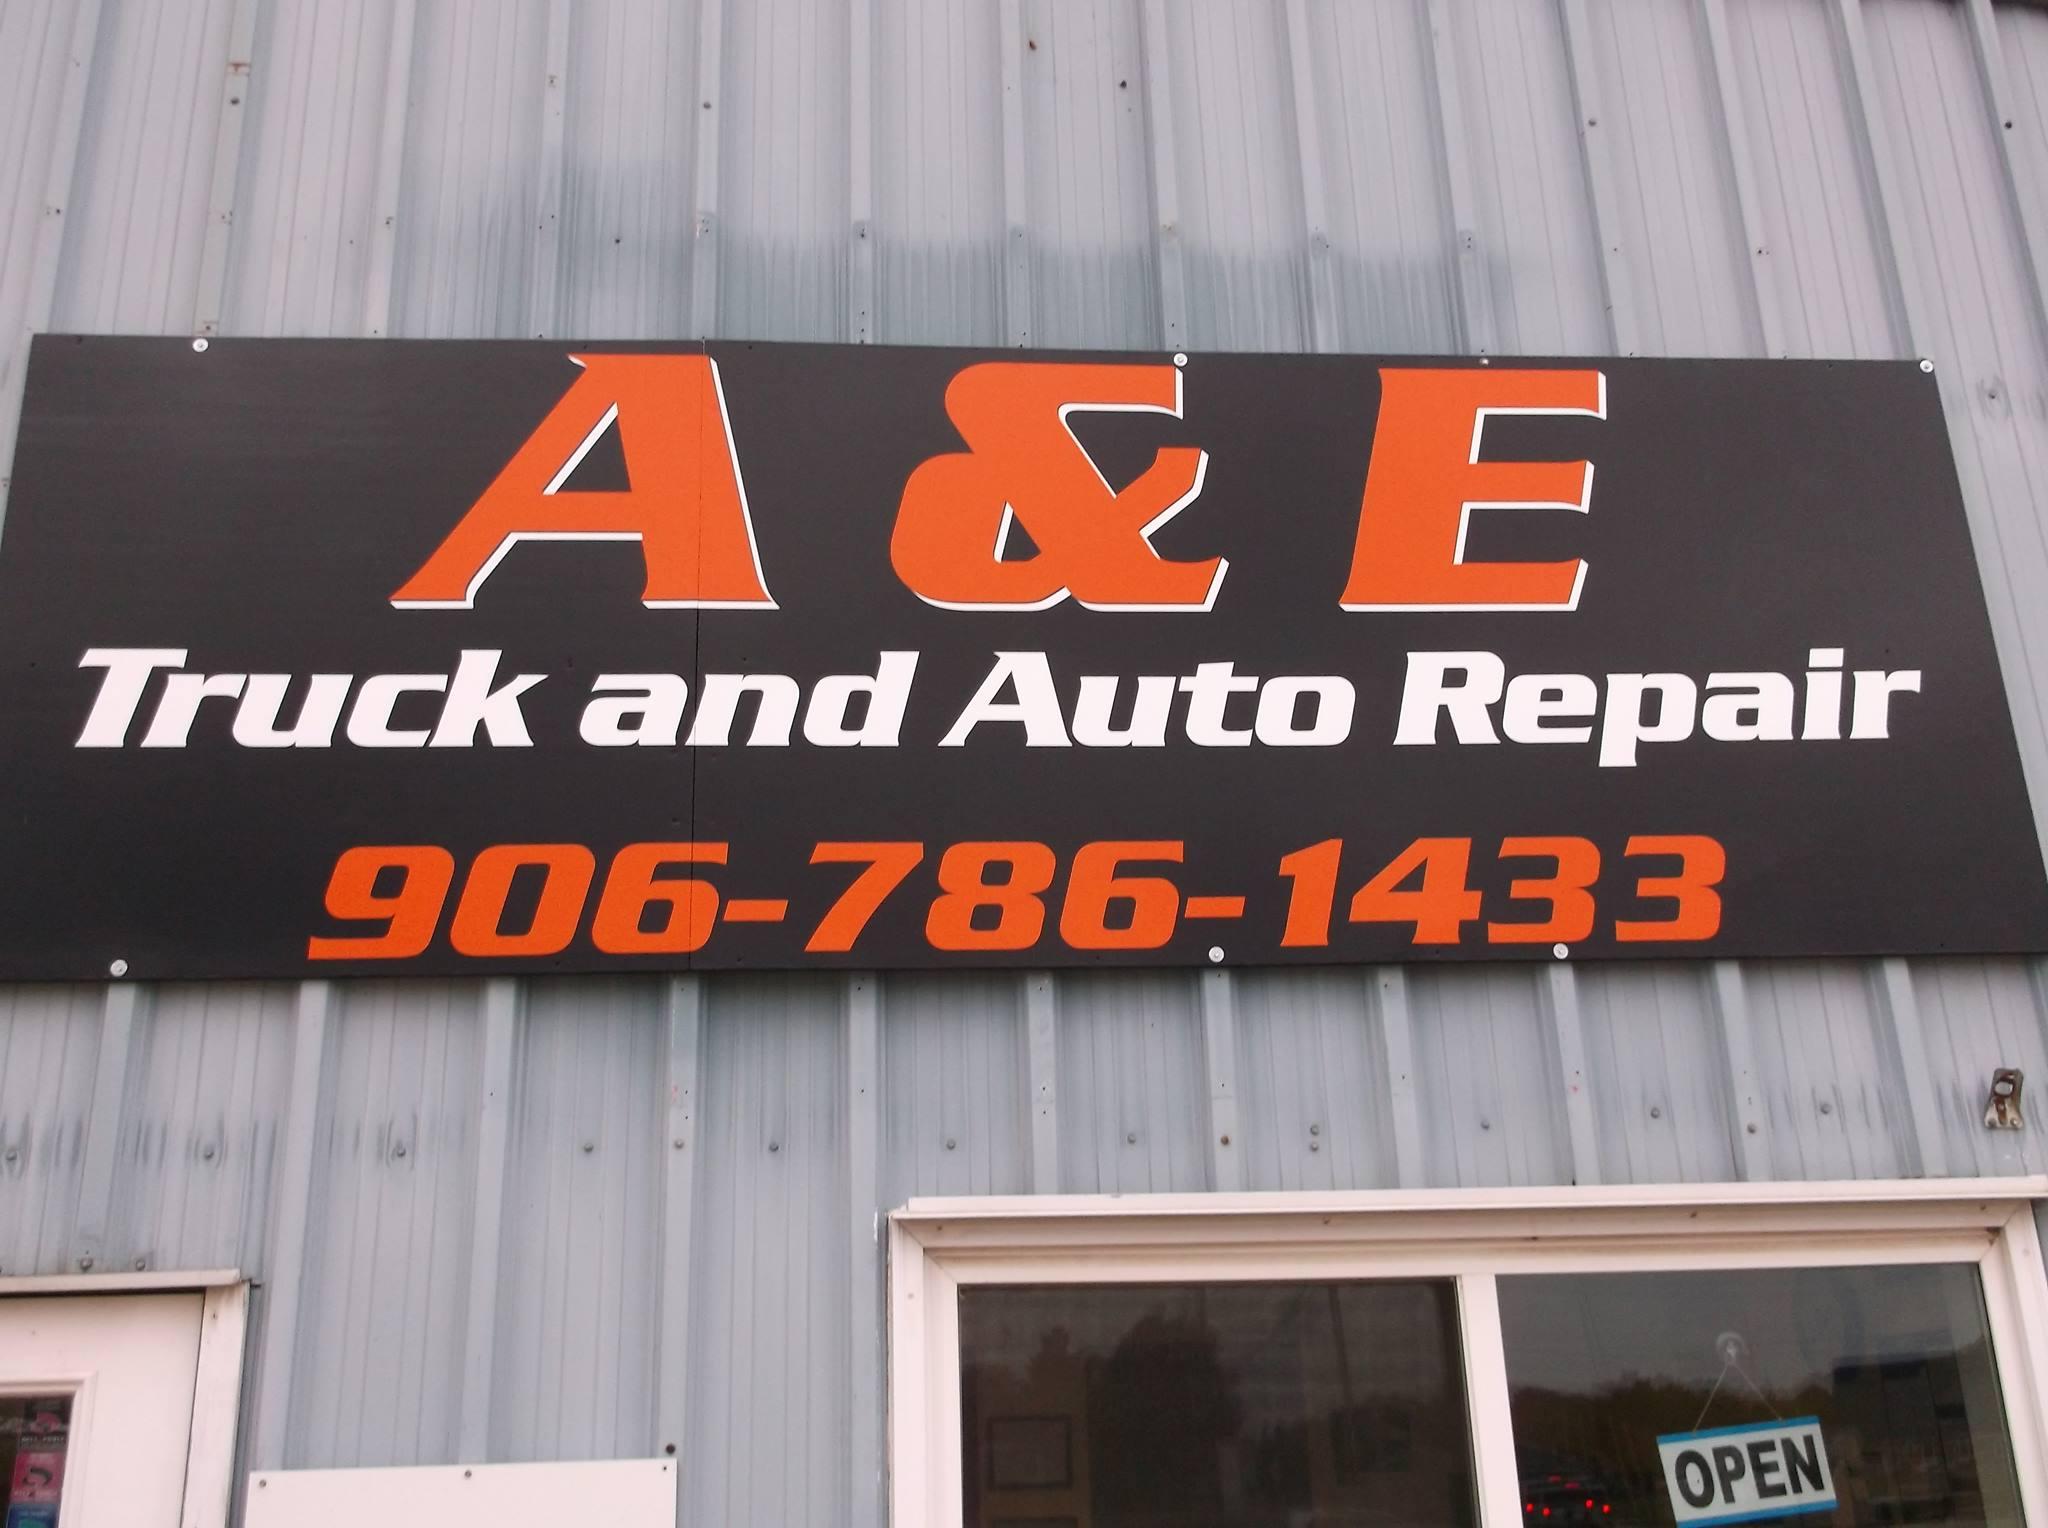 A&E Truck and Auto Repair